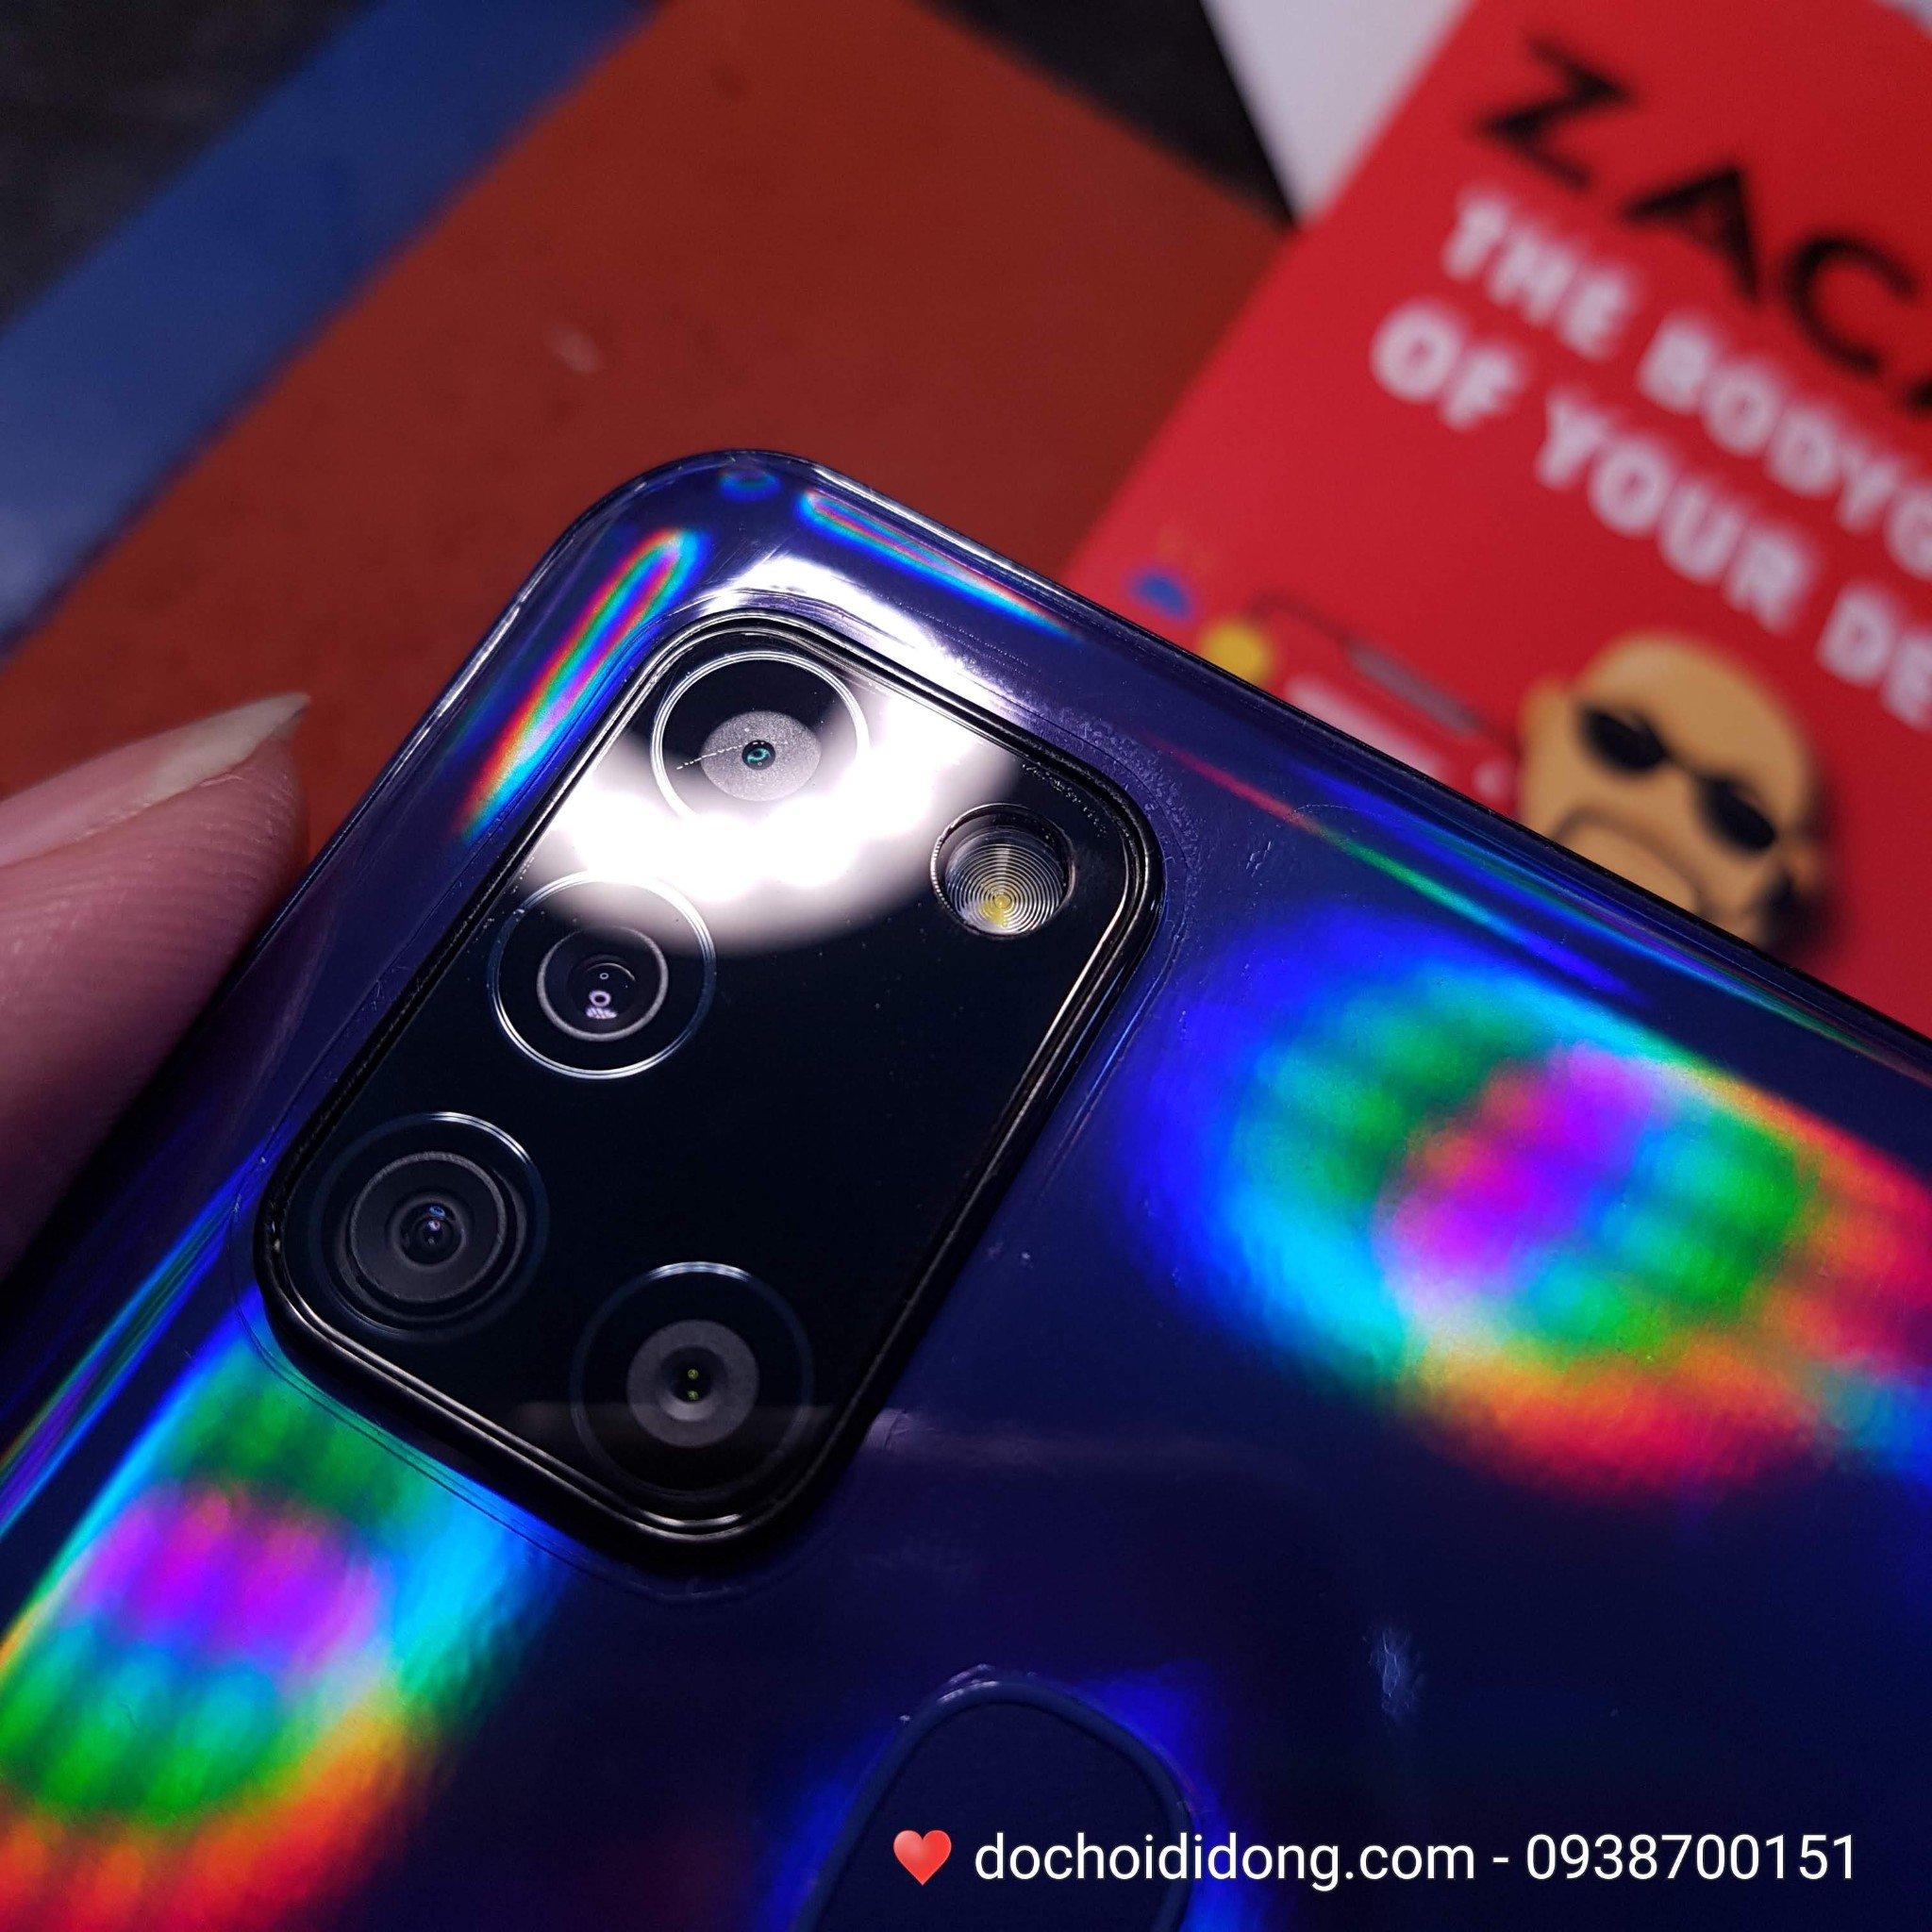 mieng-dan-cuong-luc-camera-samsung-a21s-2-5d